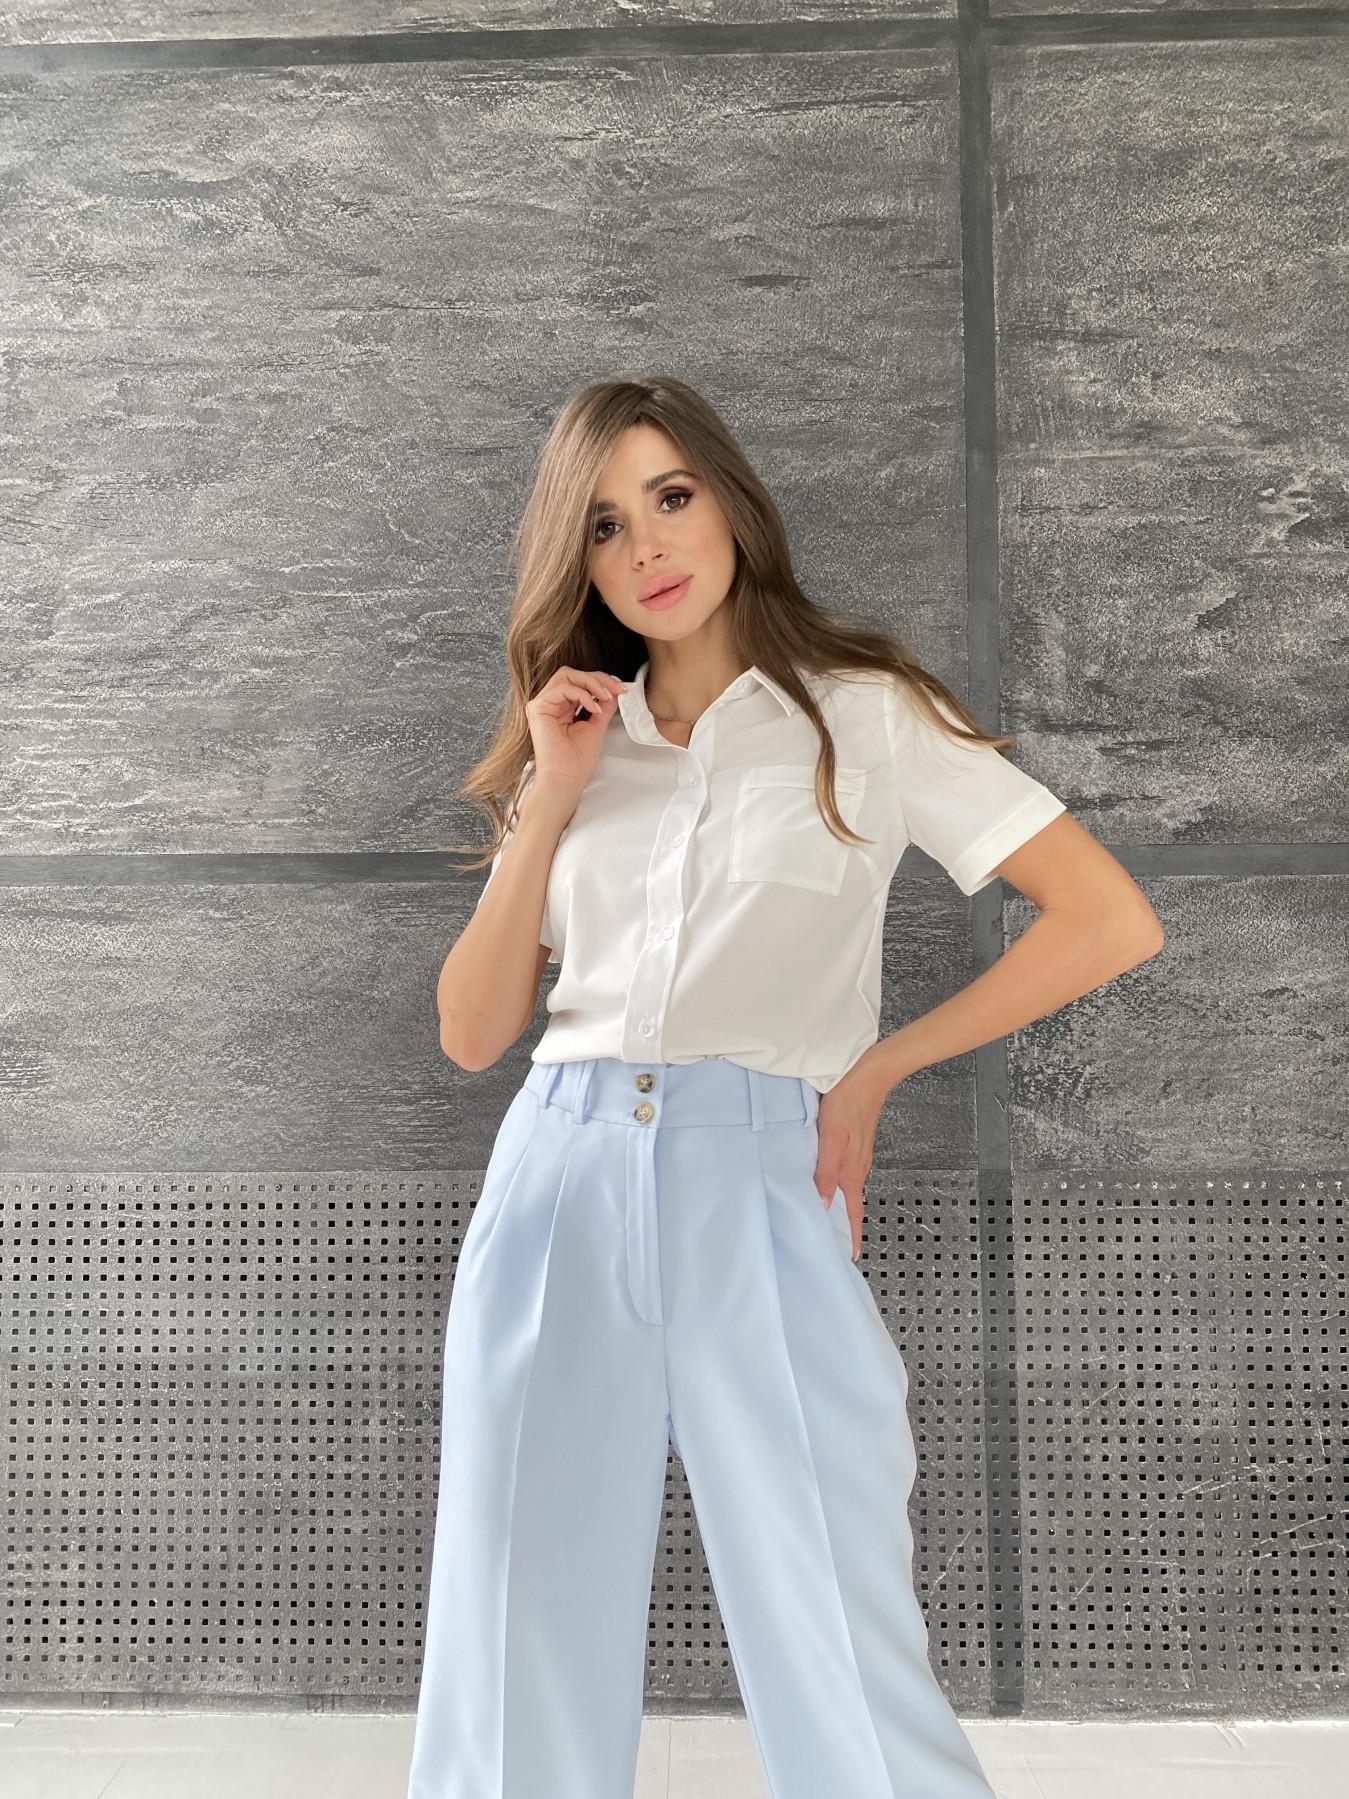 Дженна блуза  софт 11594 АРТ. 48274 Цвет: Белый - фото 6, интернет магазин tm-modus.ru